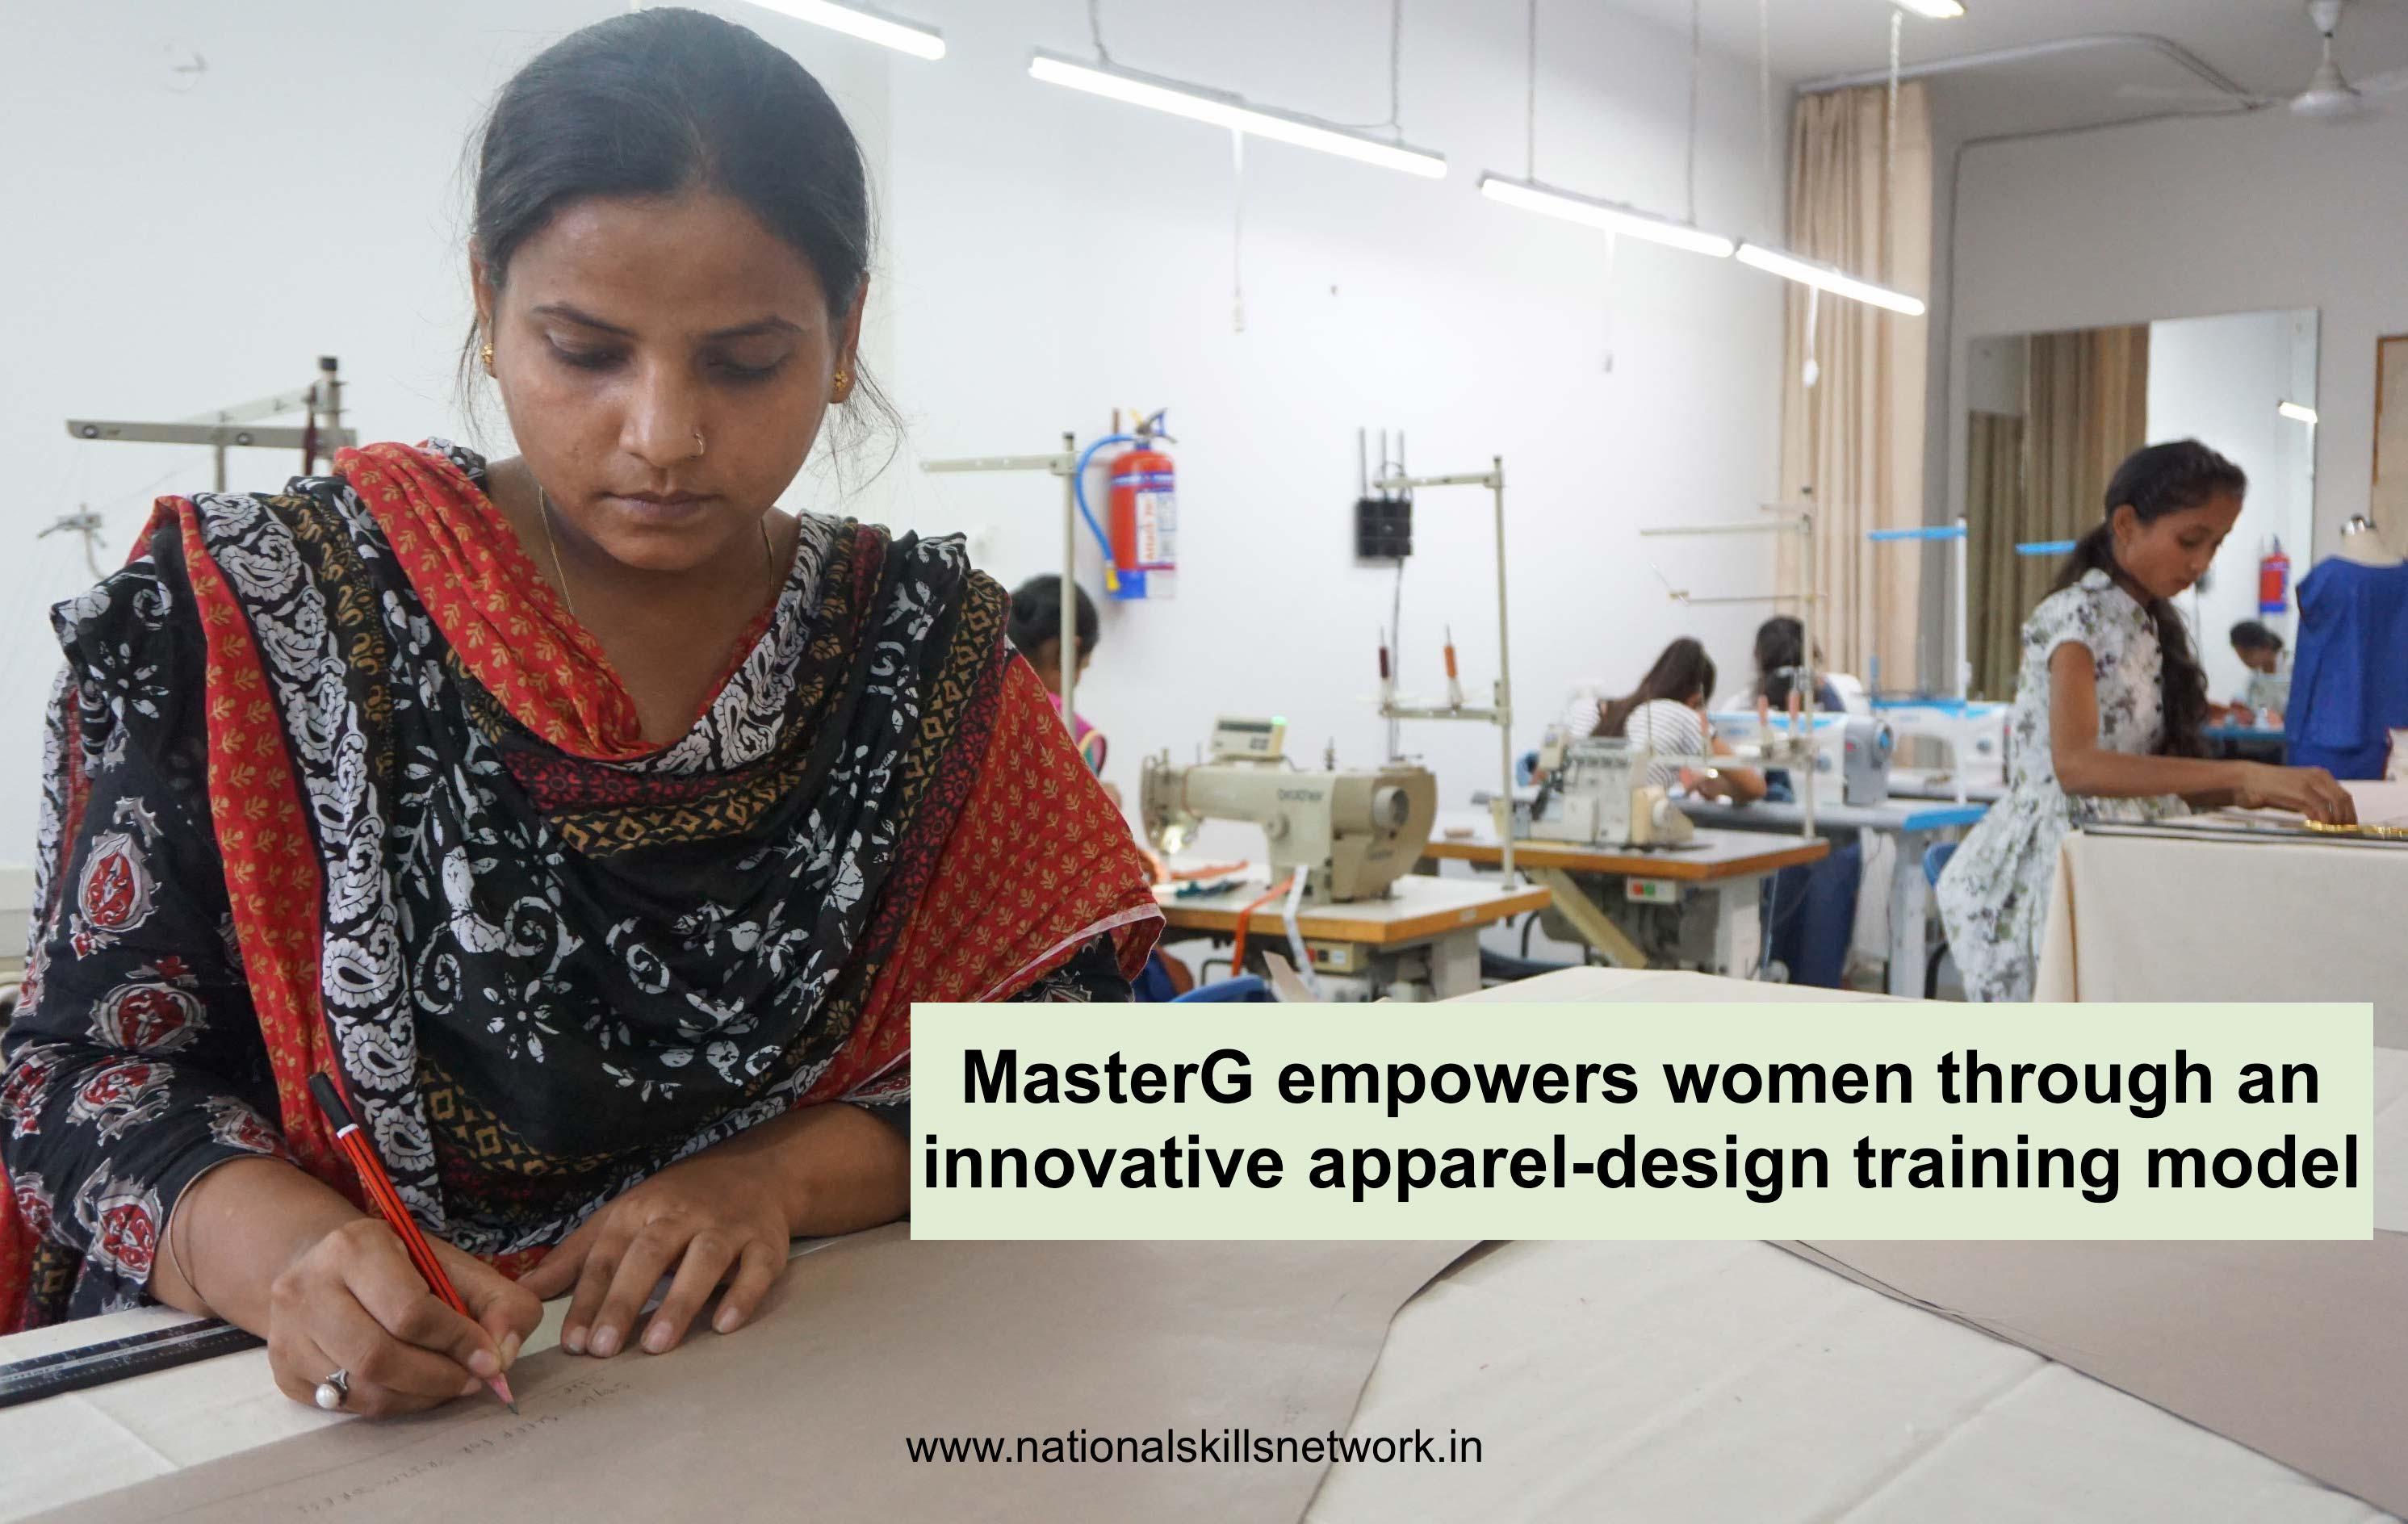 Masterg women apparel training